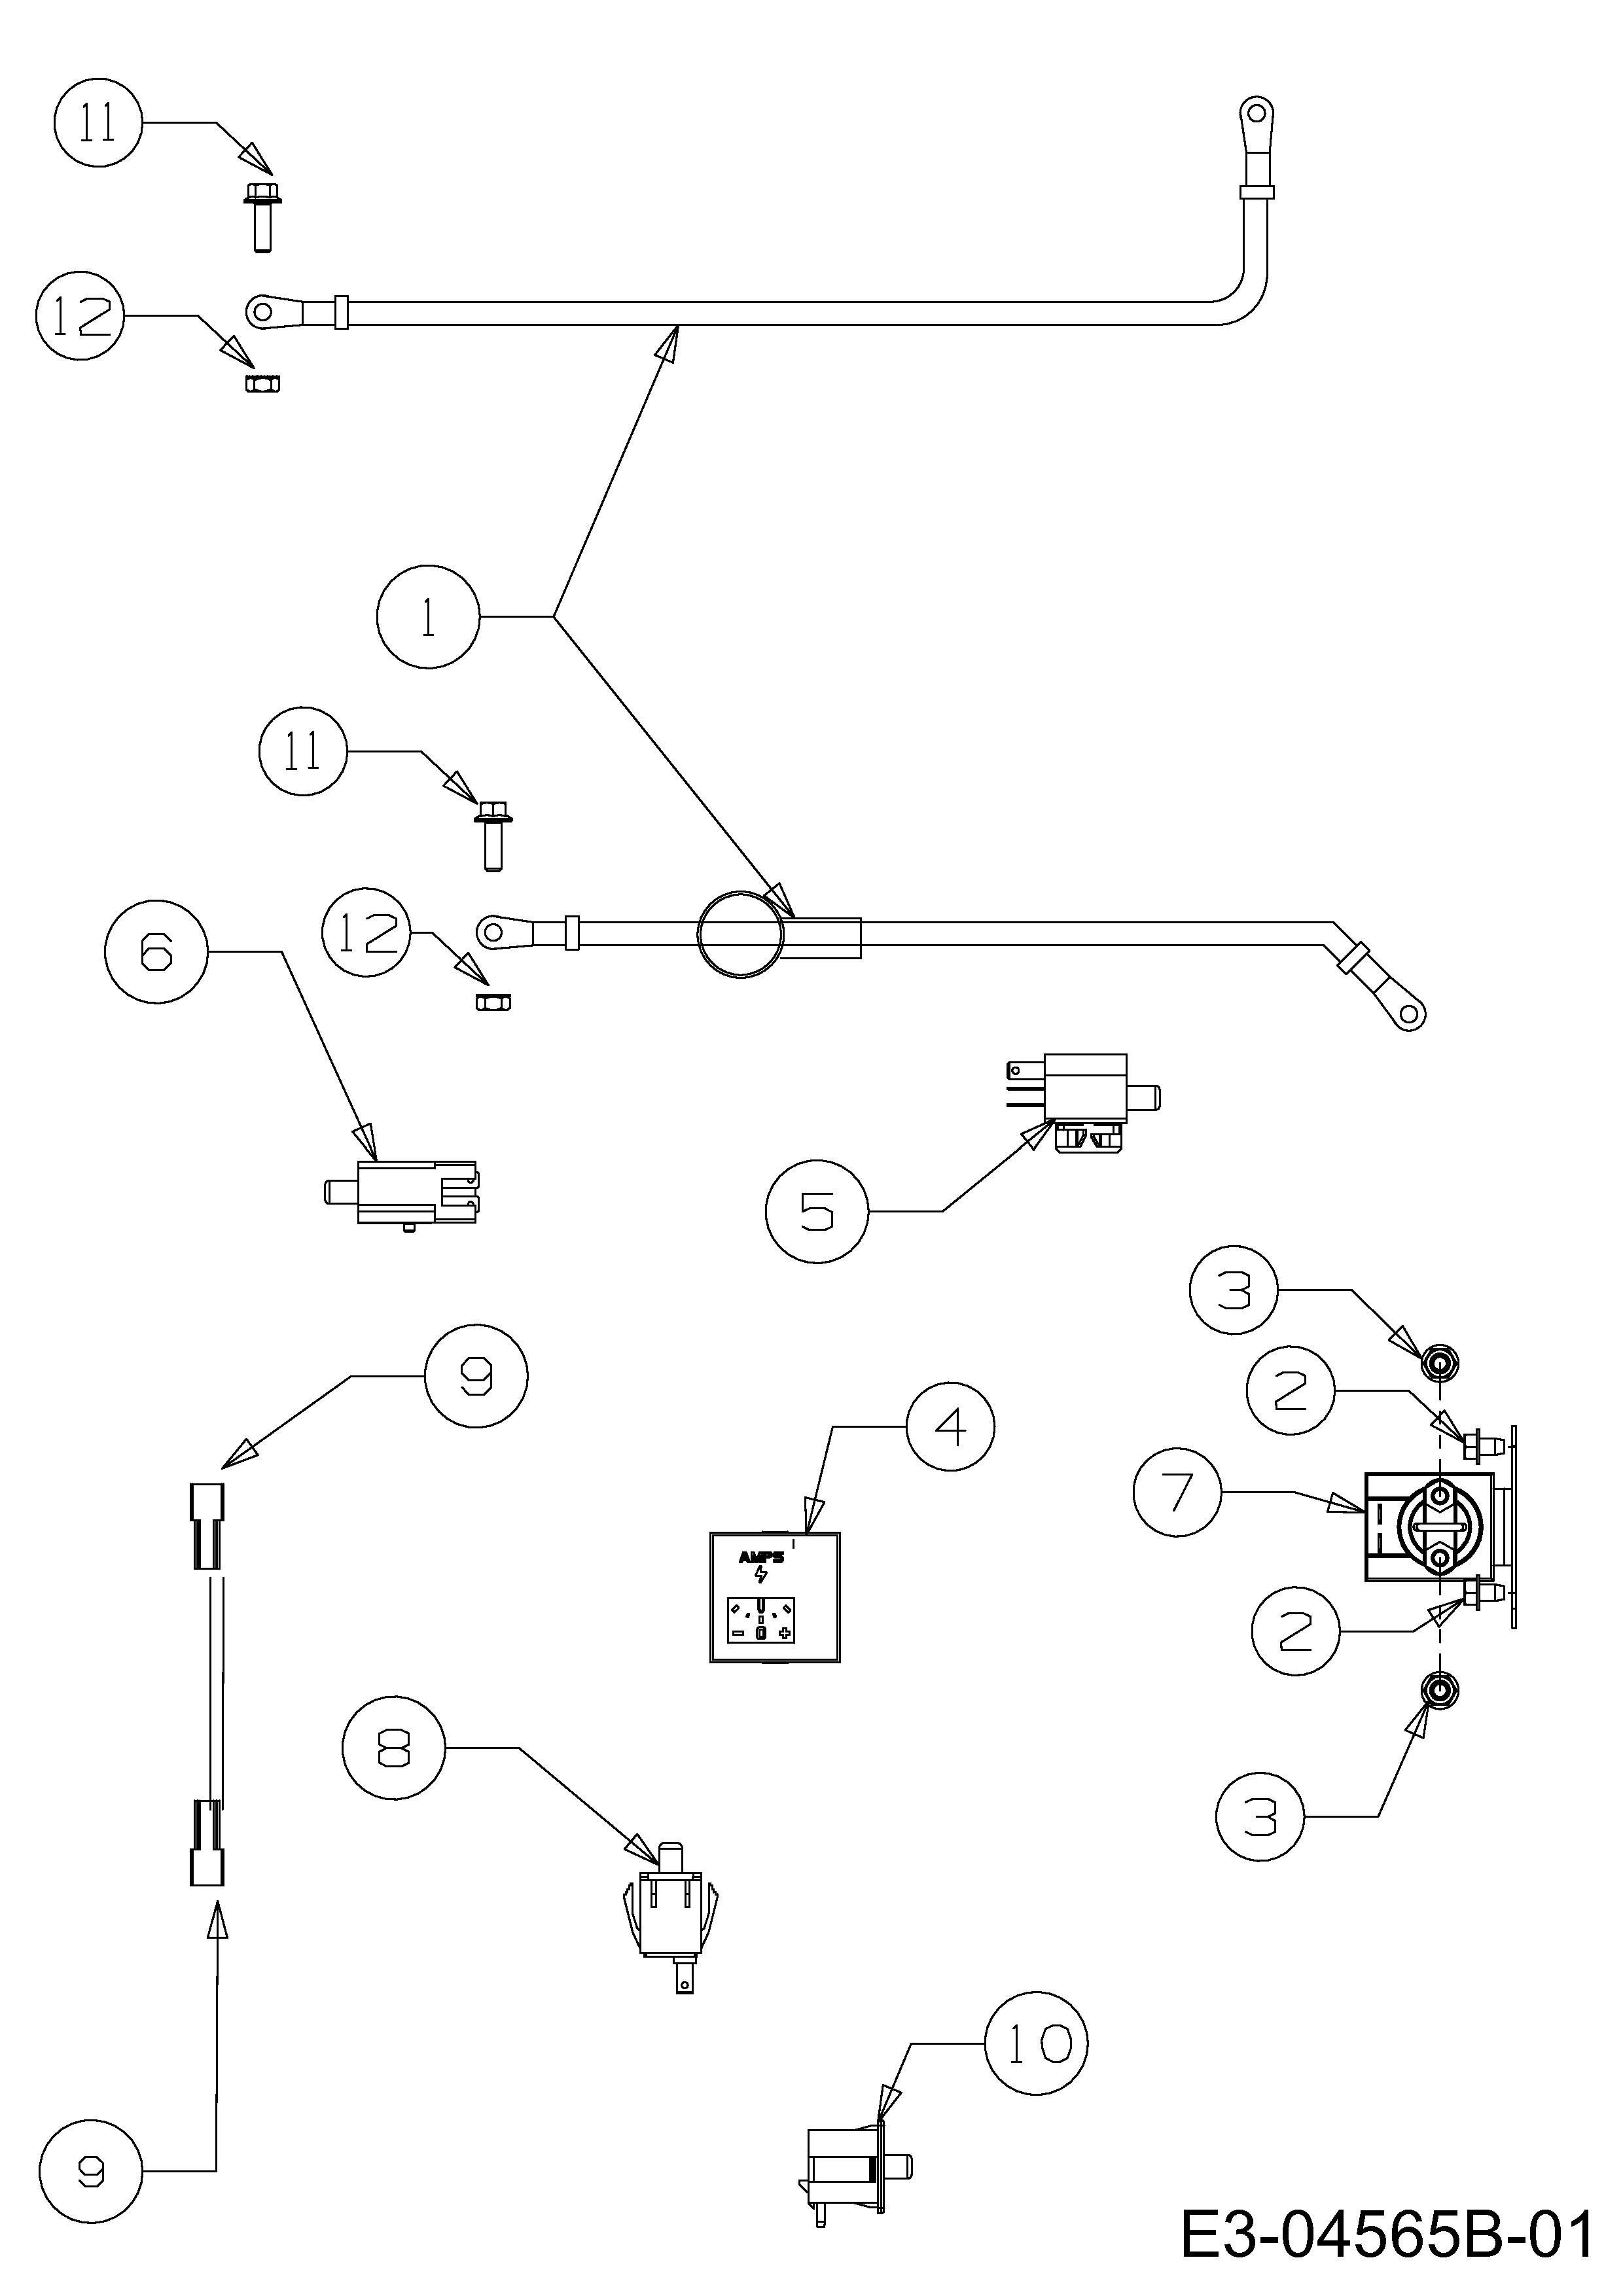 tags: #4l80e parts exploded view#4l80e transmission parts#4l80e bangs from  1 2#4l80e pan#4l80e transmission parts breakdown#corvair body parts#4l80e